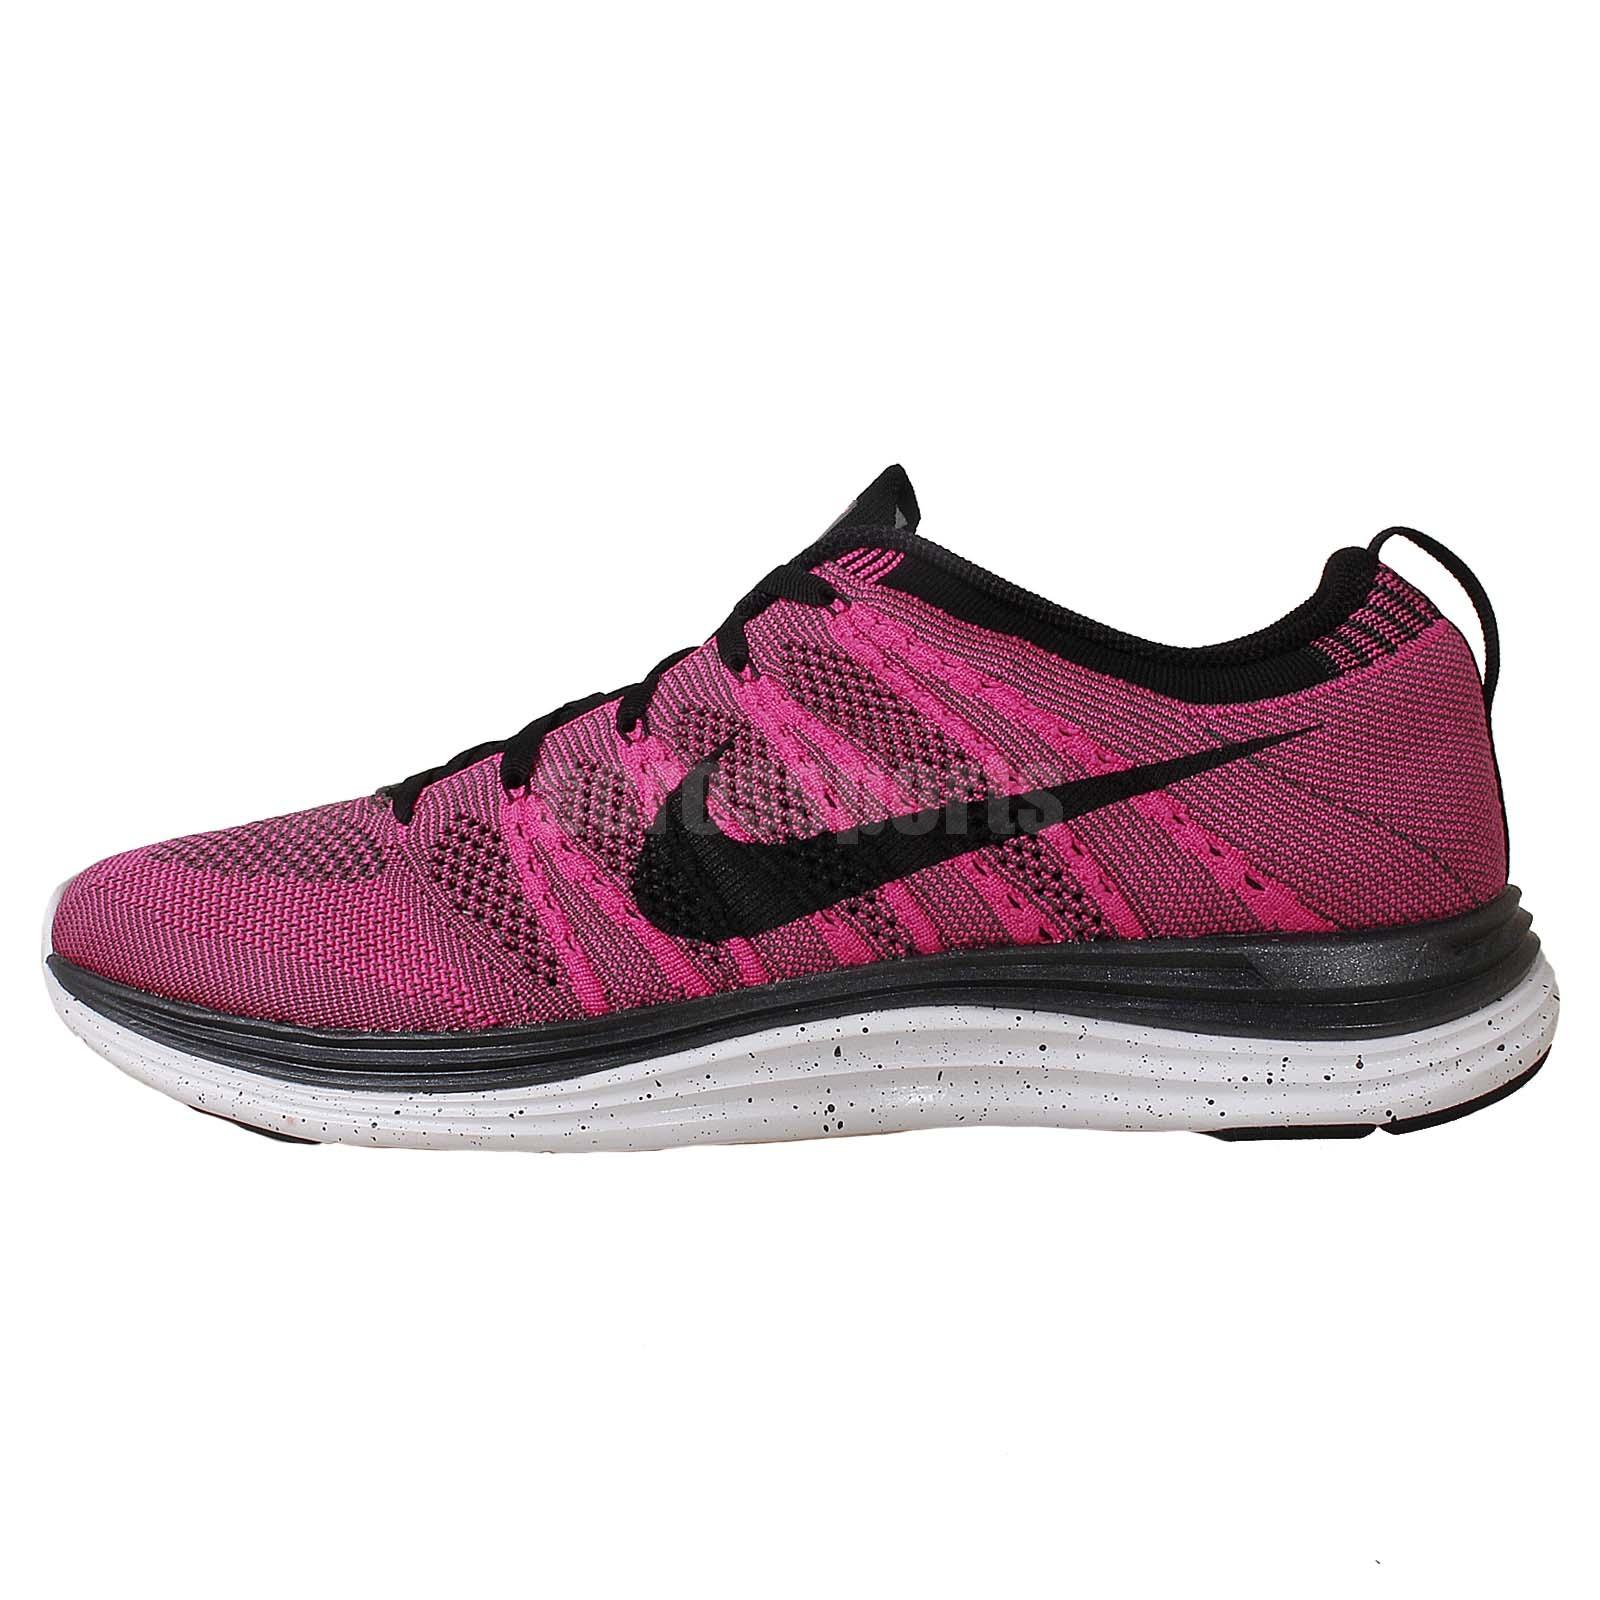 Nike Flyknit One Mens Lunarlon Lunar 1 Trainers Pink Black ...